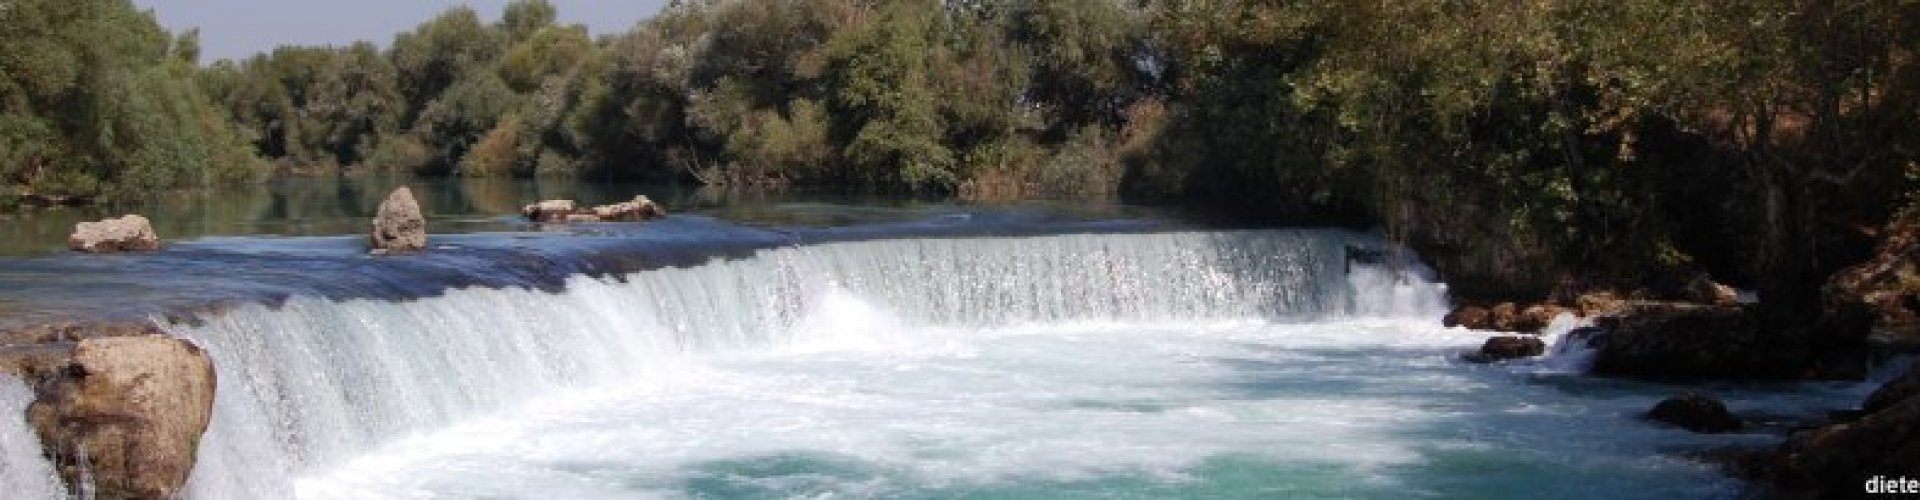 Manavgat-Wasserfall